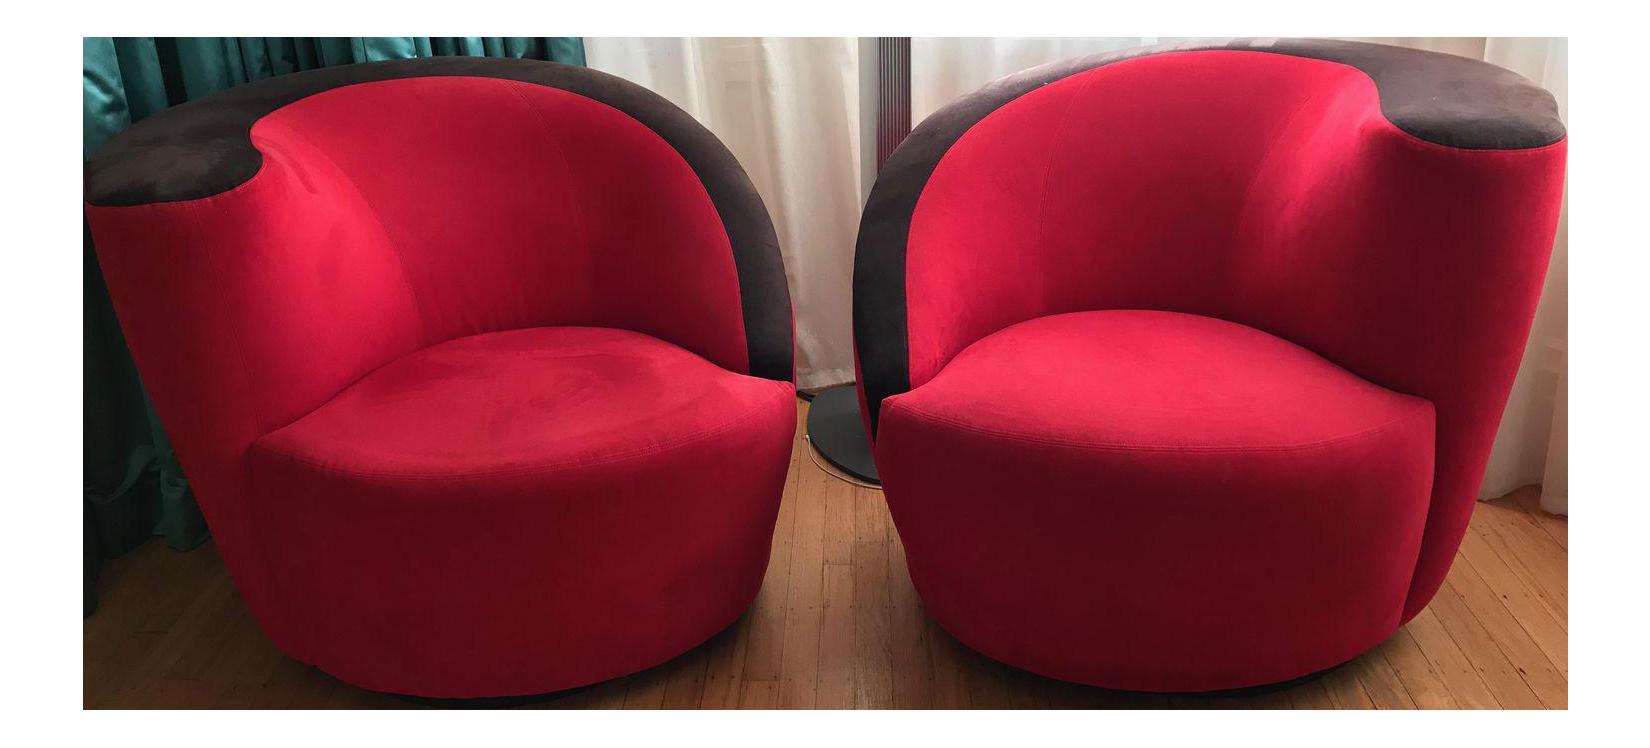 Vladimir Kagan Nautilus Chairs   A Pair   Image 1 Of 7